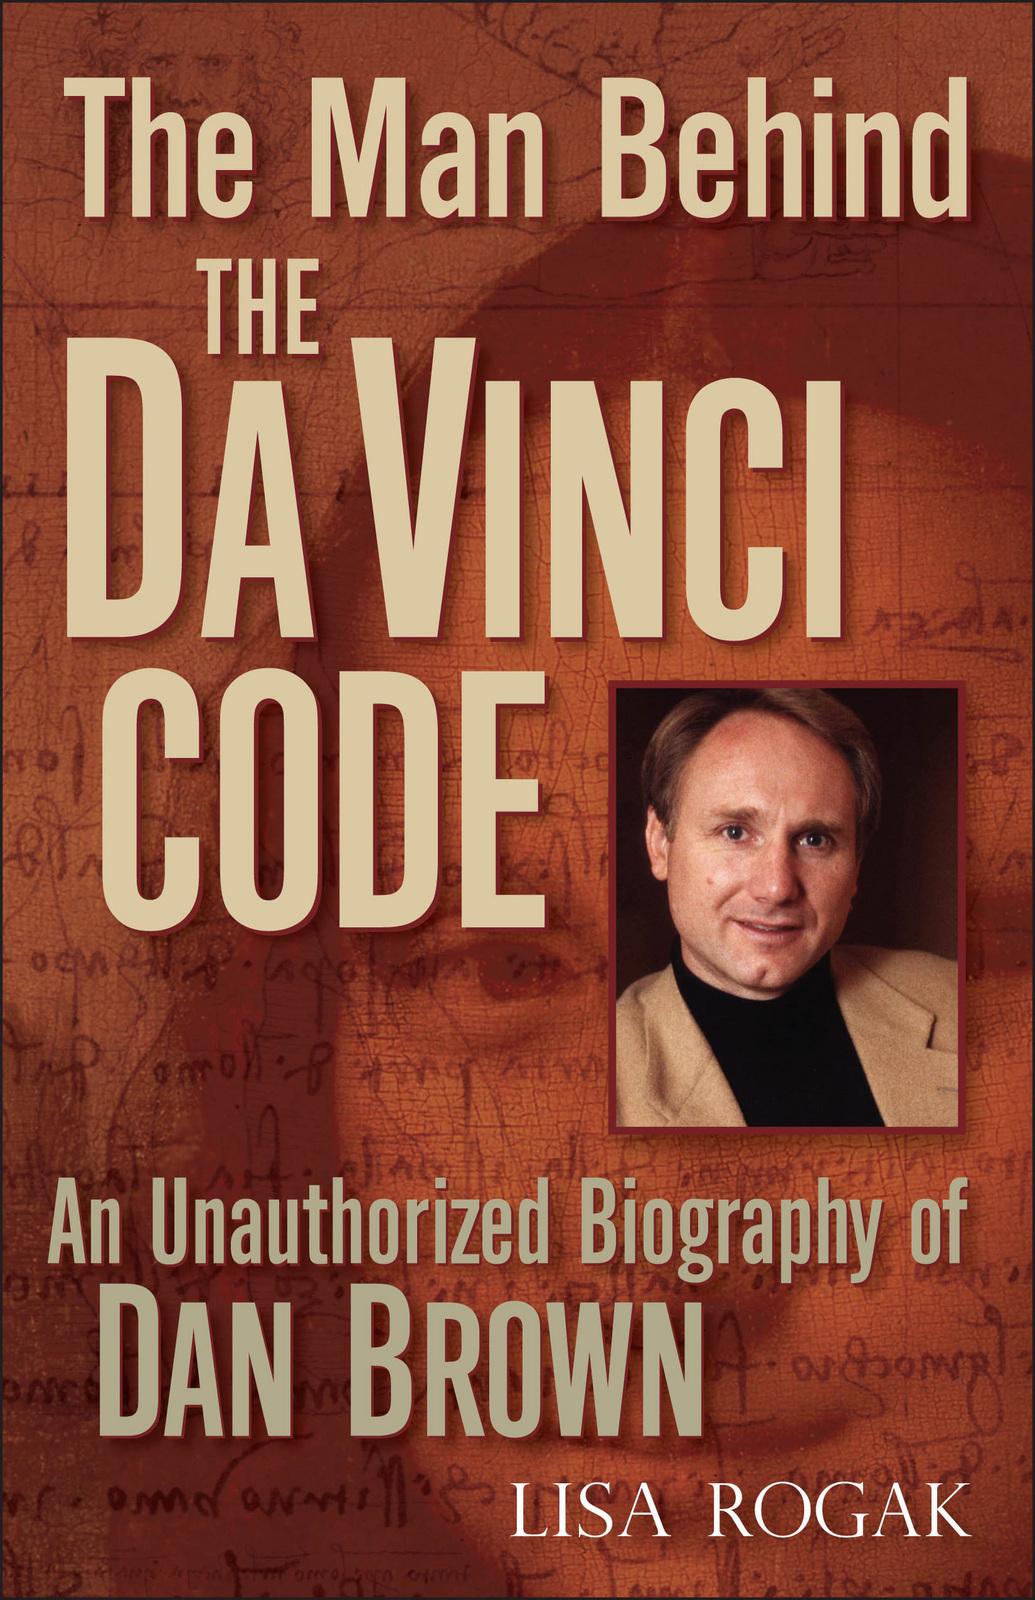 The Da Vinci Code Dan Brown Audio Book 12 CD ~ NEW ~